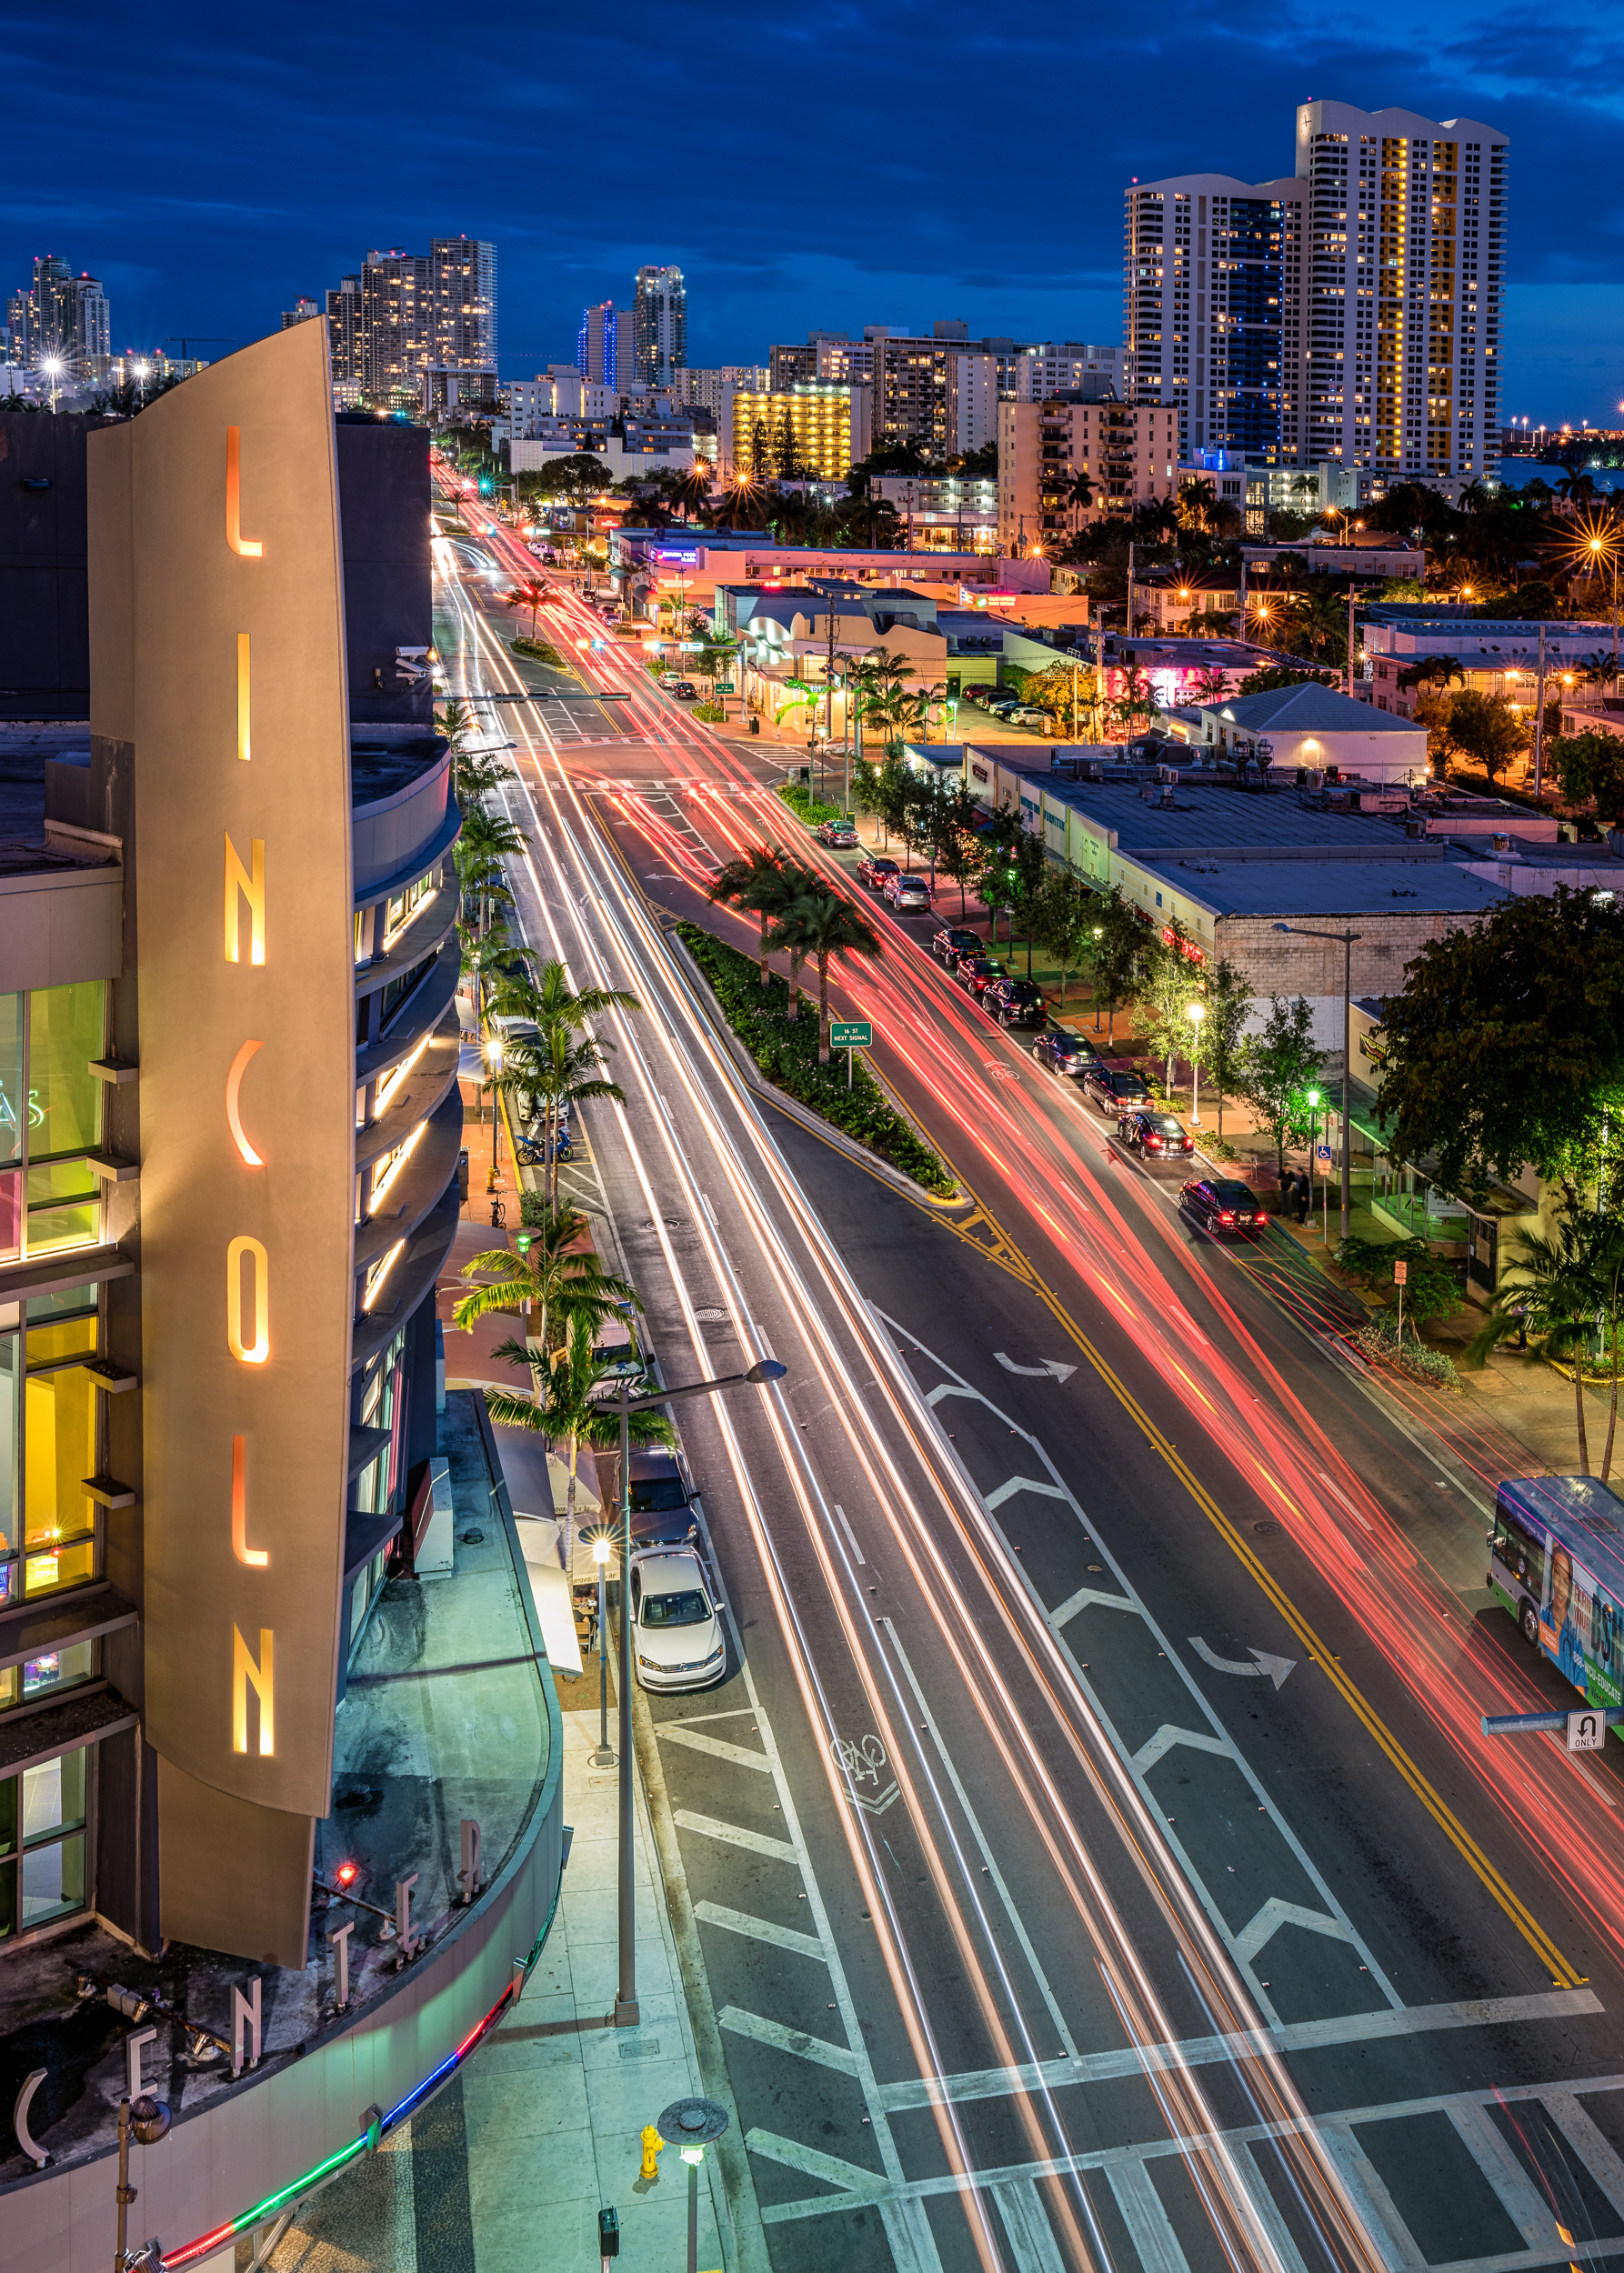 Lincoln_Road_Miami_Beach_commercial_photographer_Franklin_Castillo-Edit.jpg